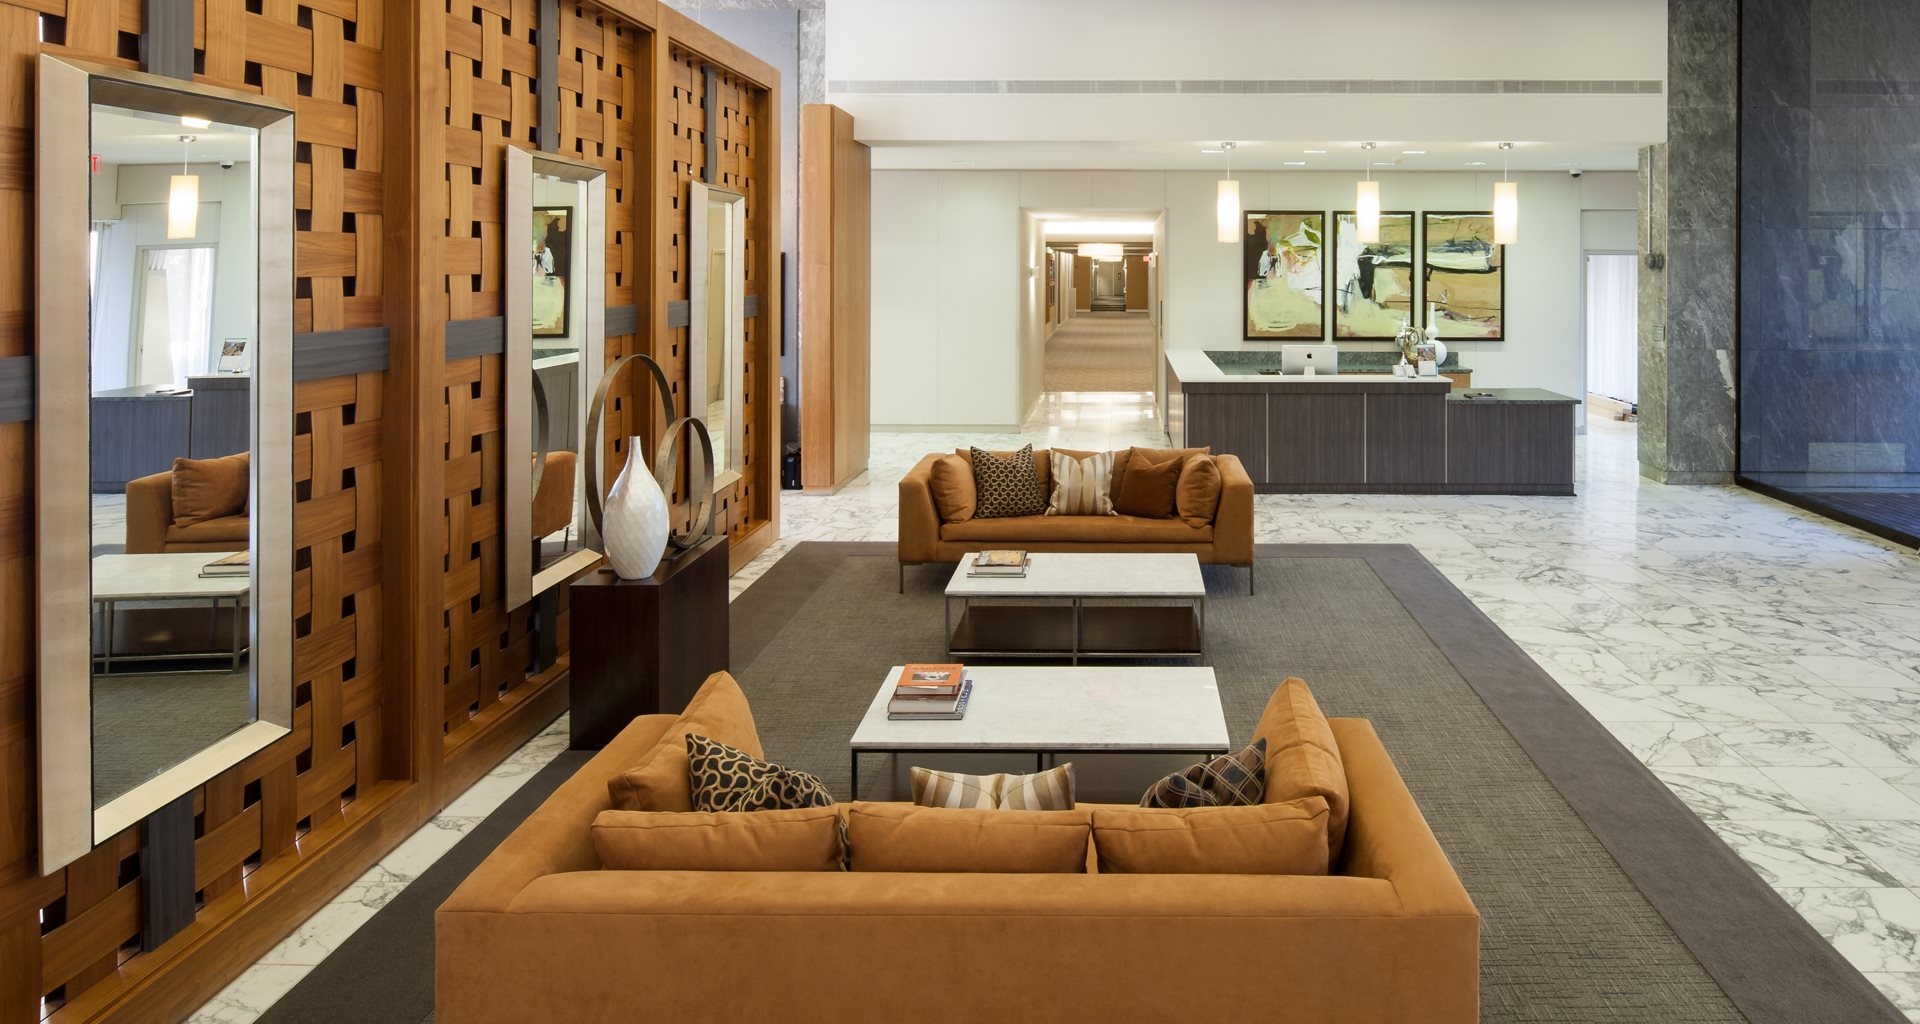 Crystal Square Apartments | Apartments in Arlington, VA